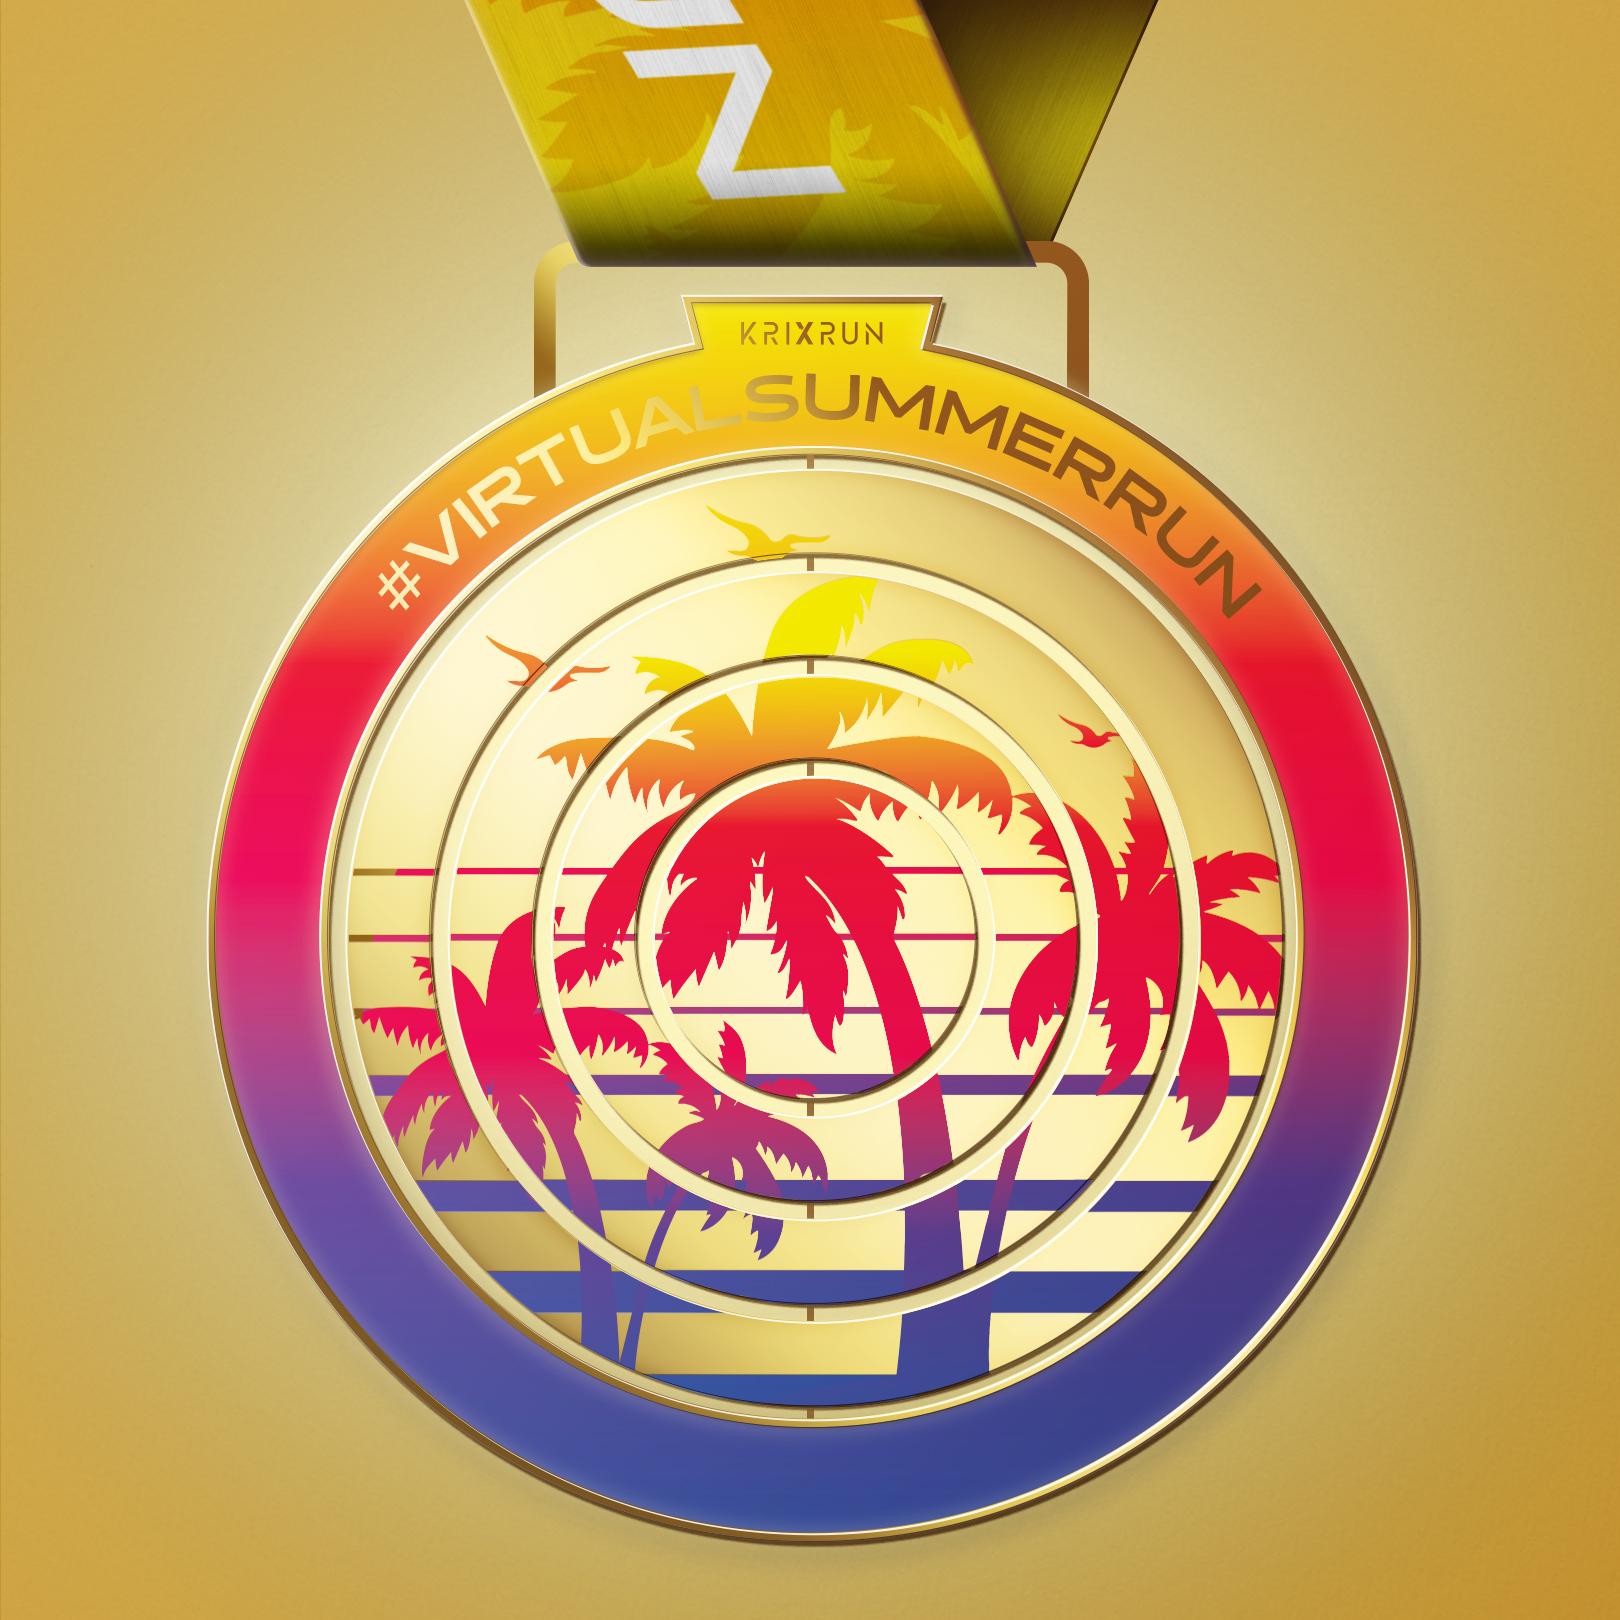 Virtual-summer-run-medal-visual-back